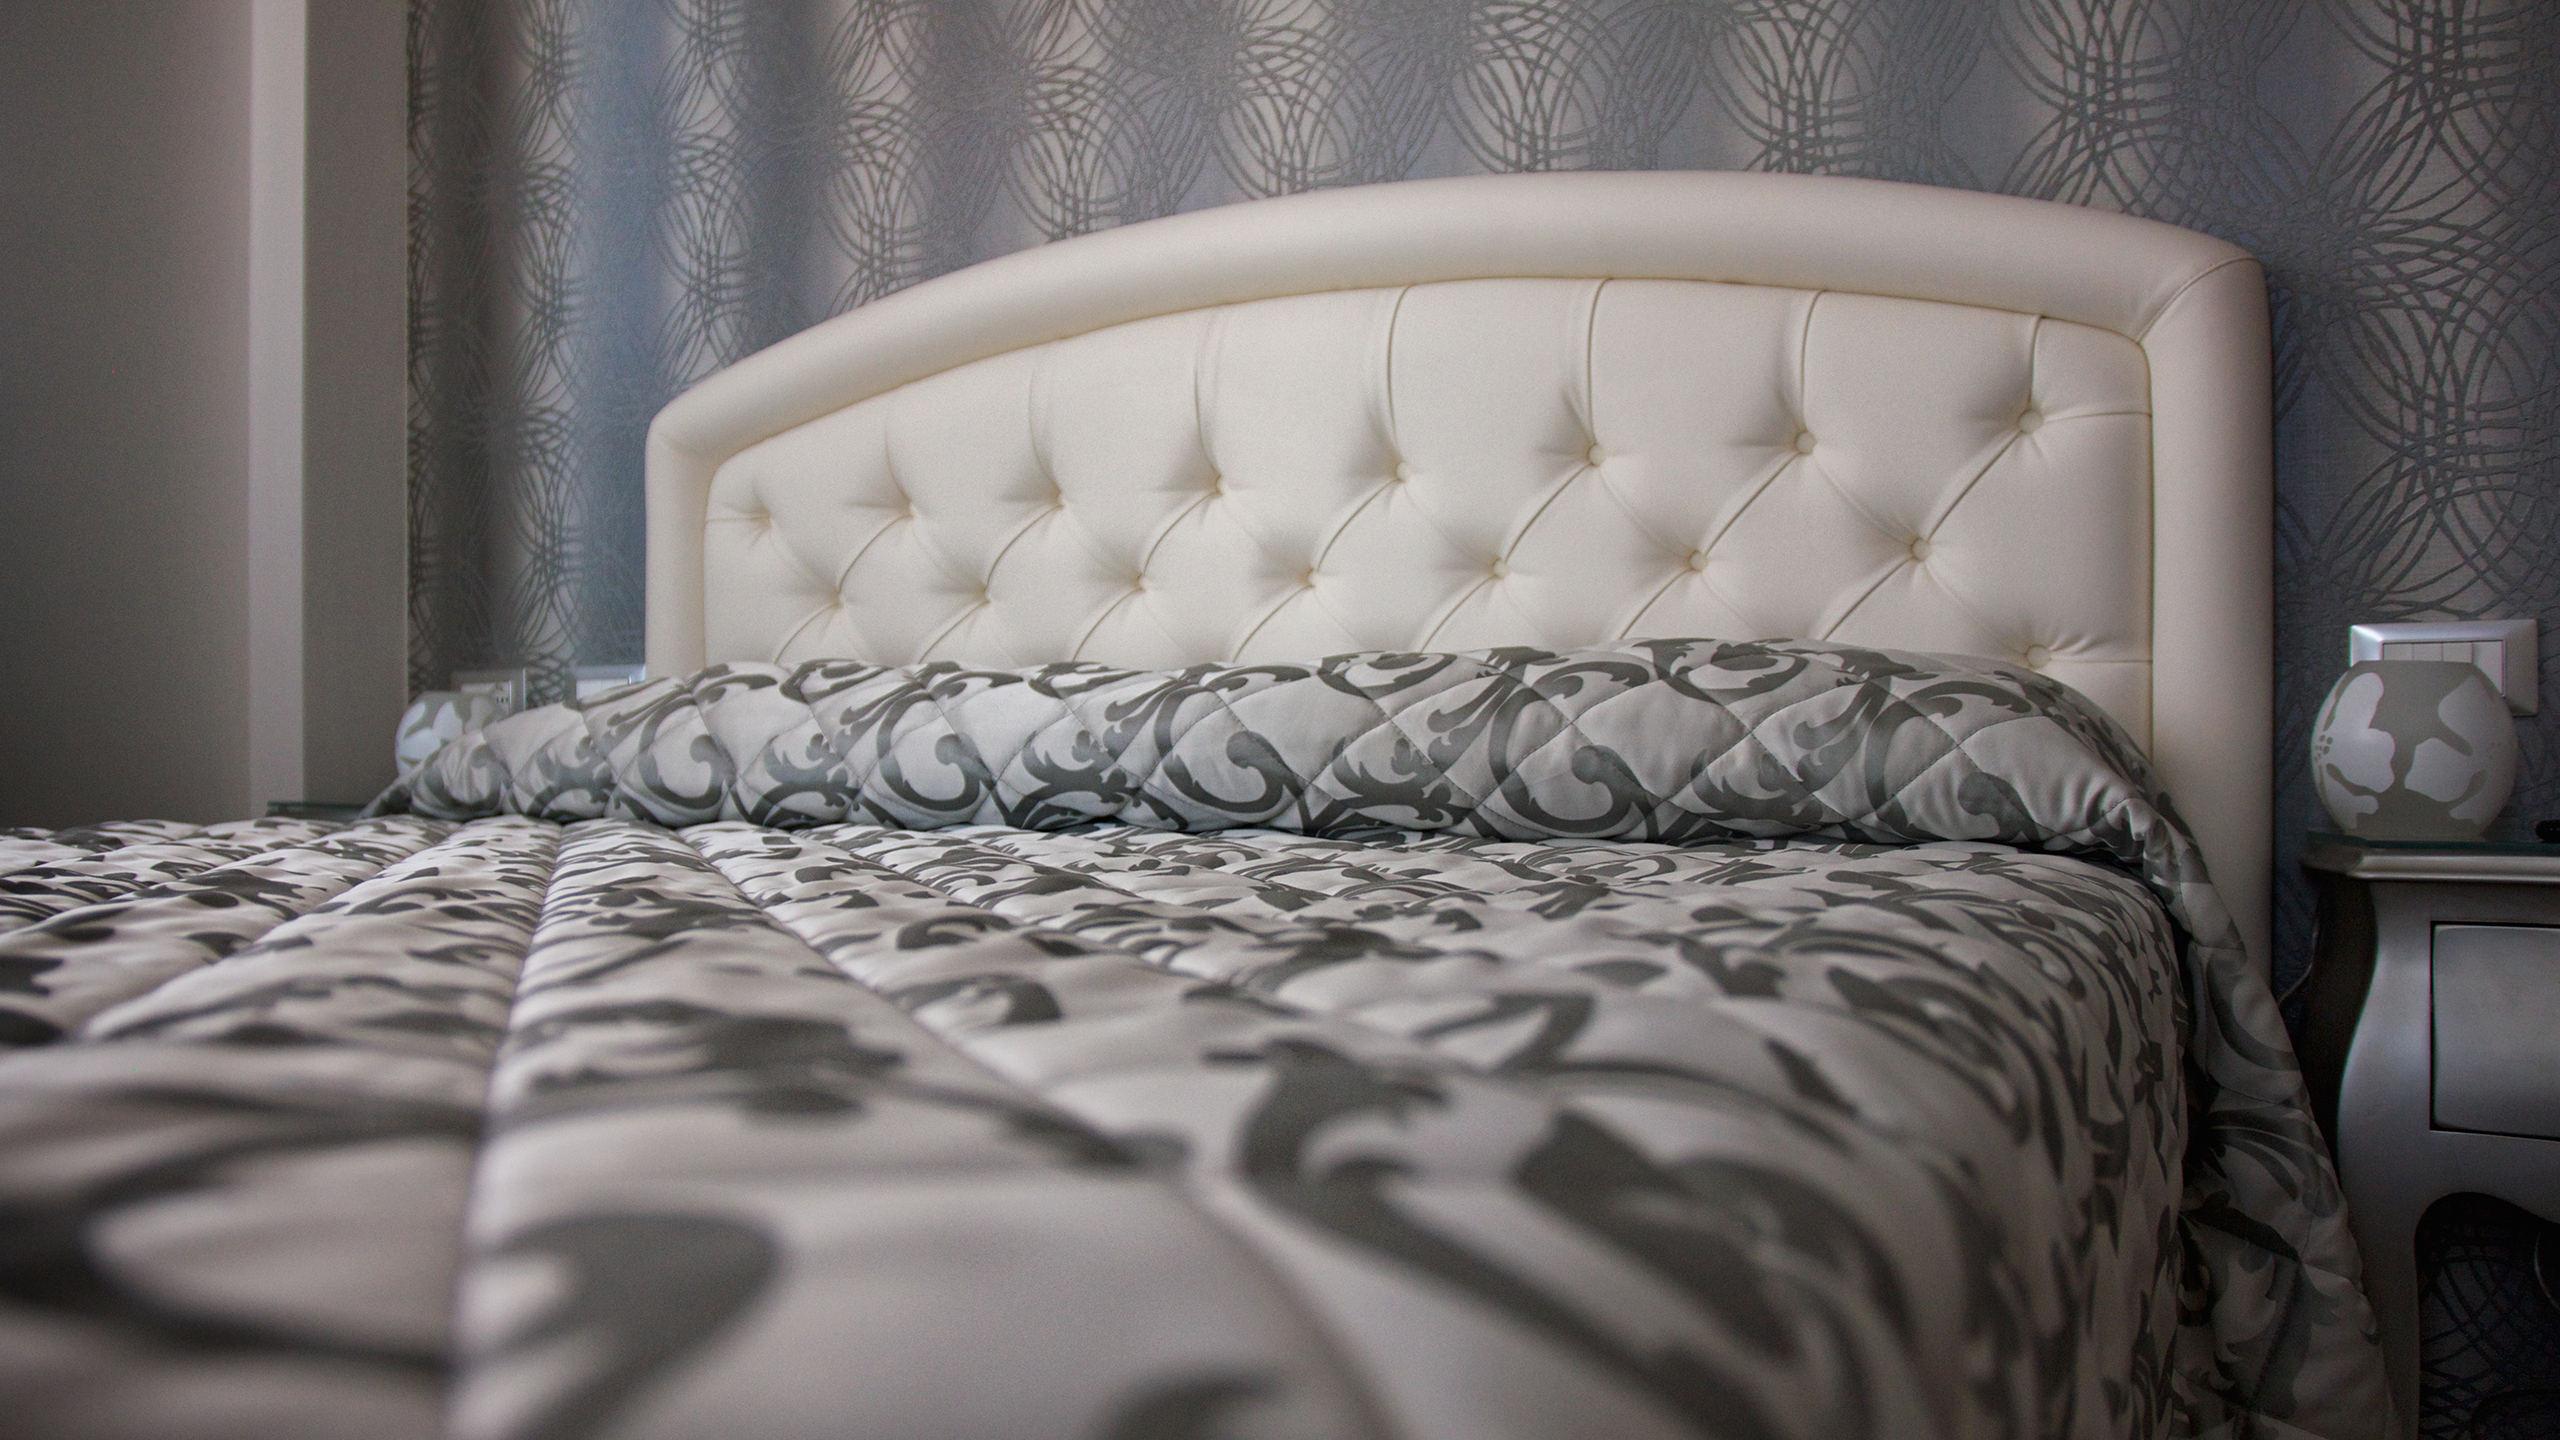 oc-hotel-villa-adriana-camere-001